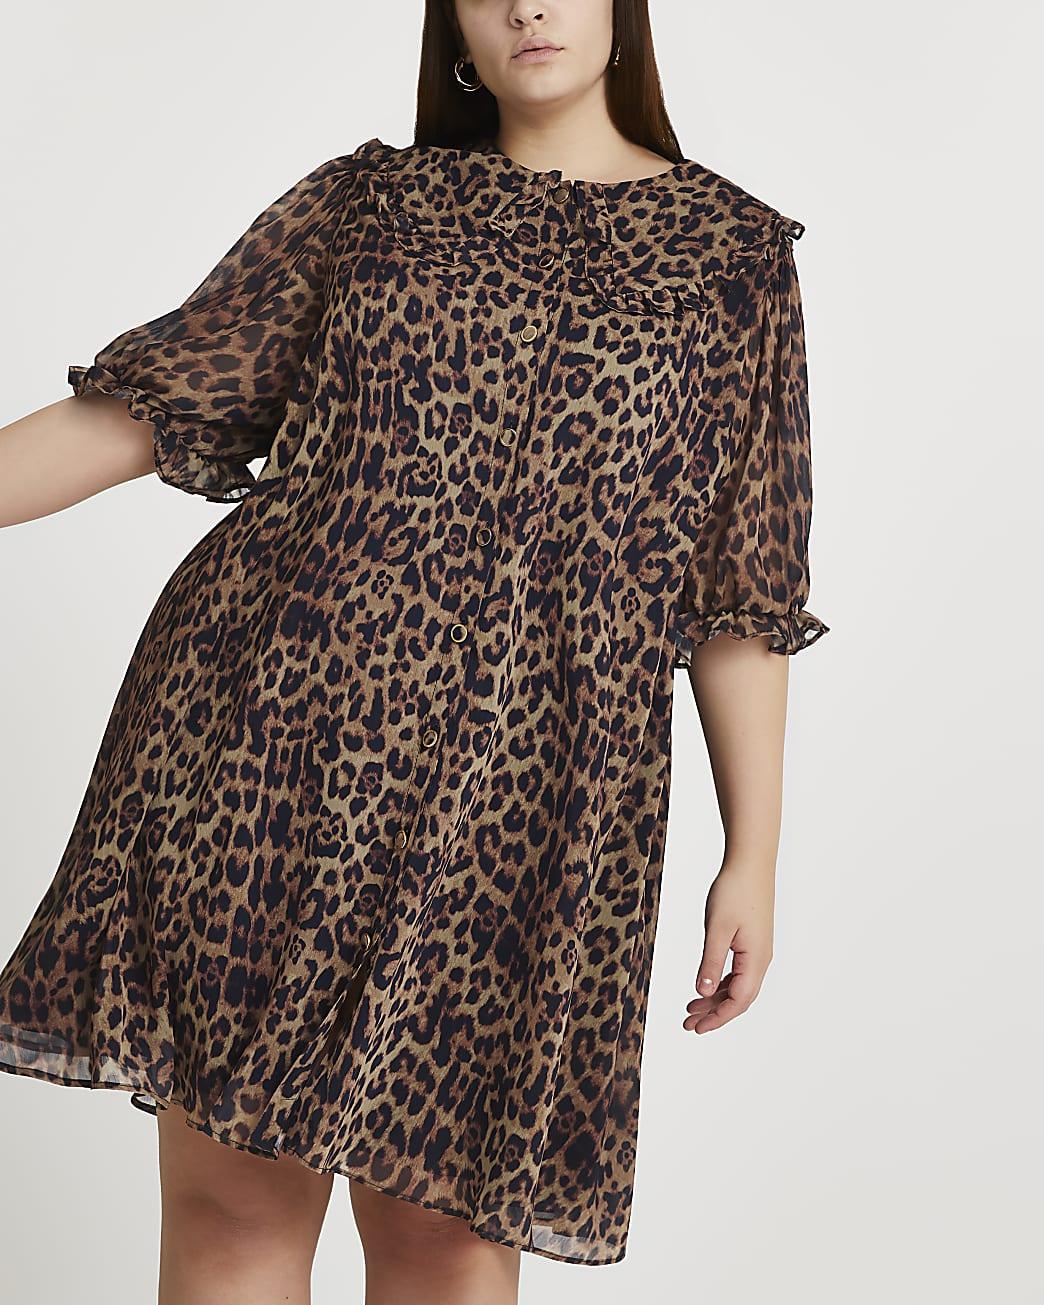 Black collar animal print shift dress